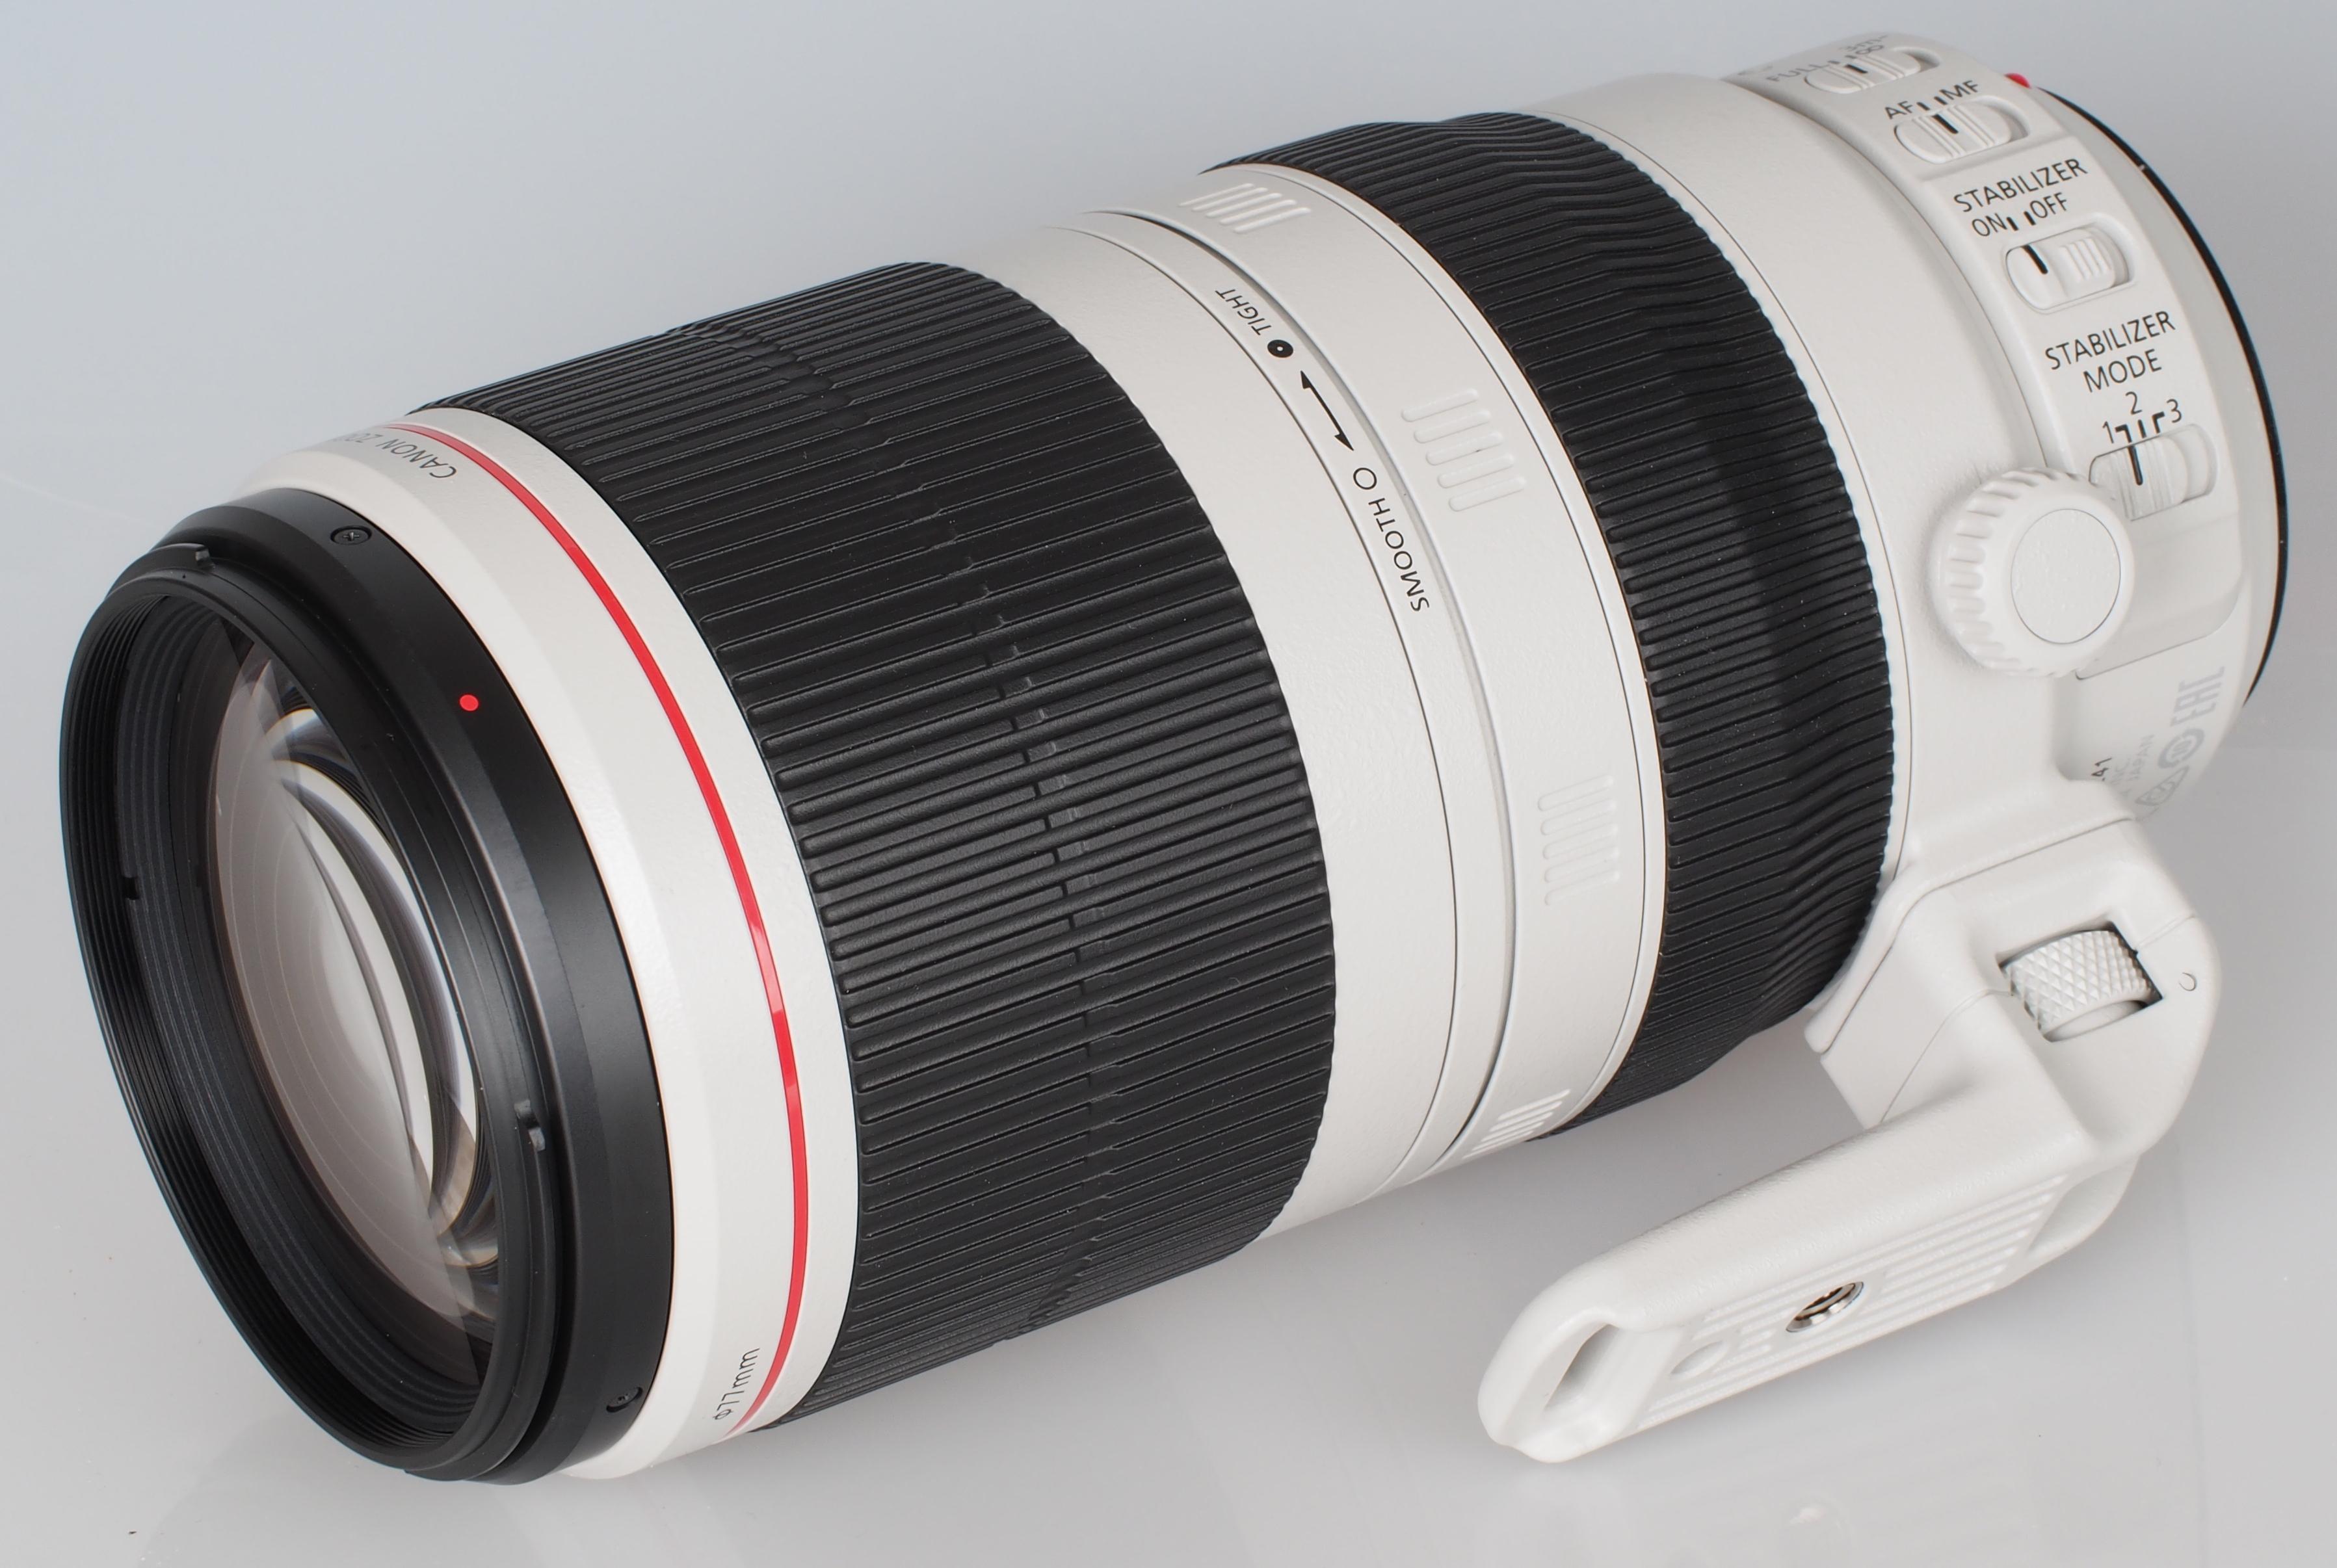 Canon Ef 100 400mm F 4 5 5 6l Is Ii Usm Lens Review Ephotozine